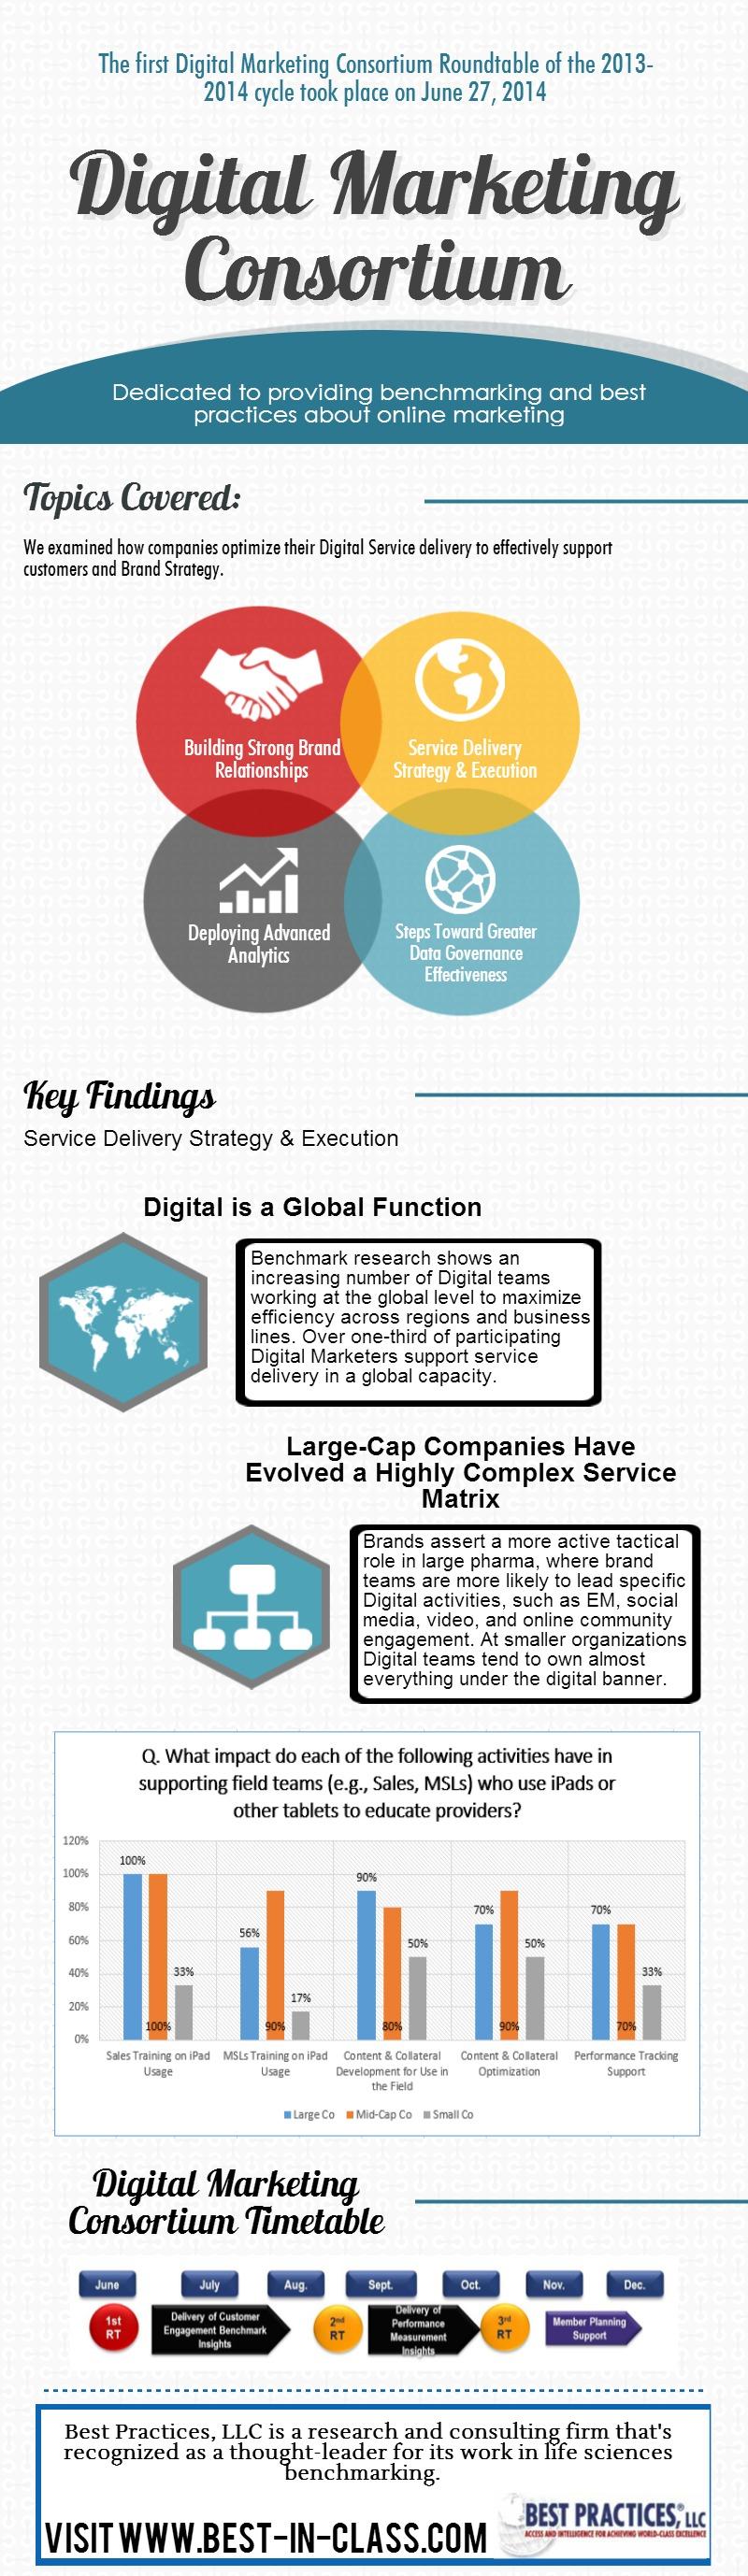 Digital Marketing Consortium - DRAFT Copy